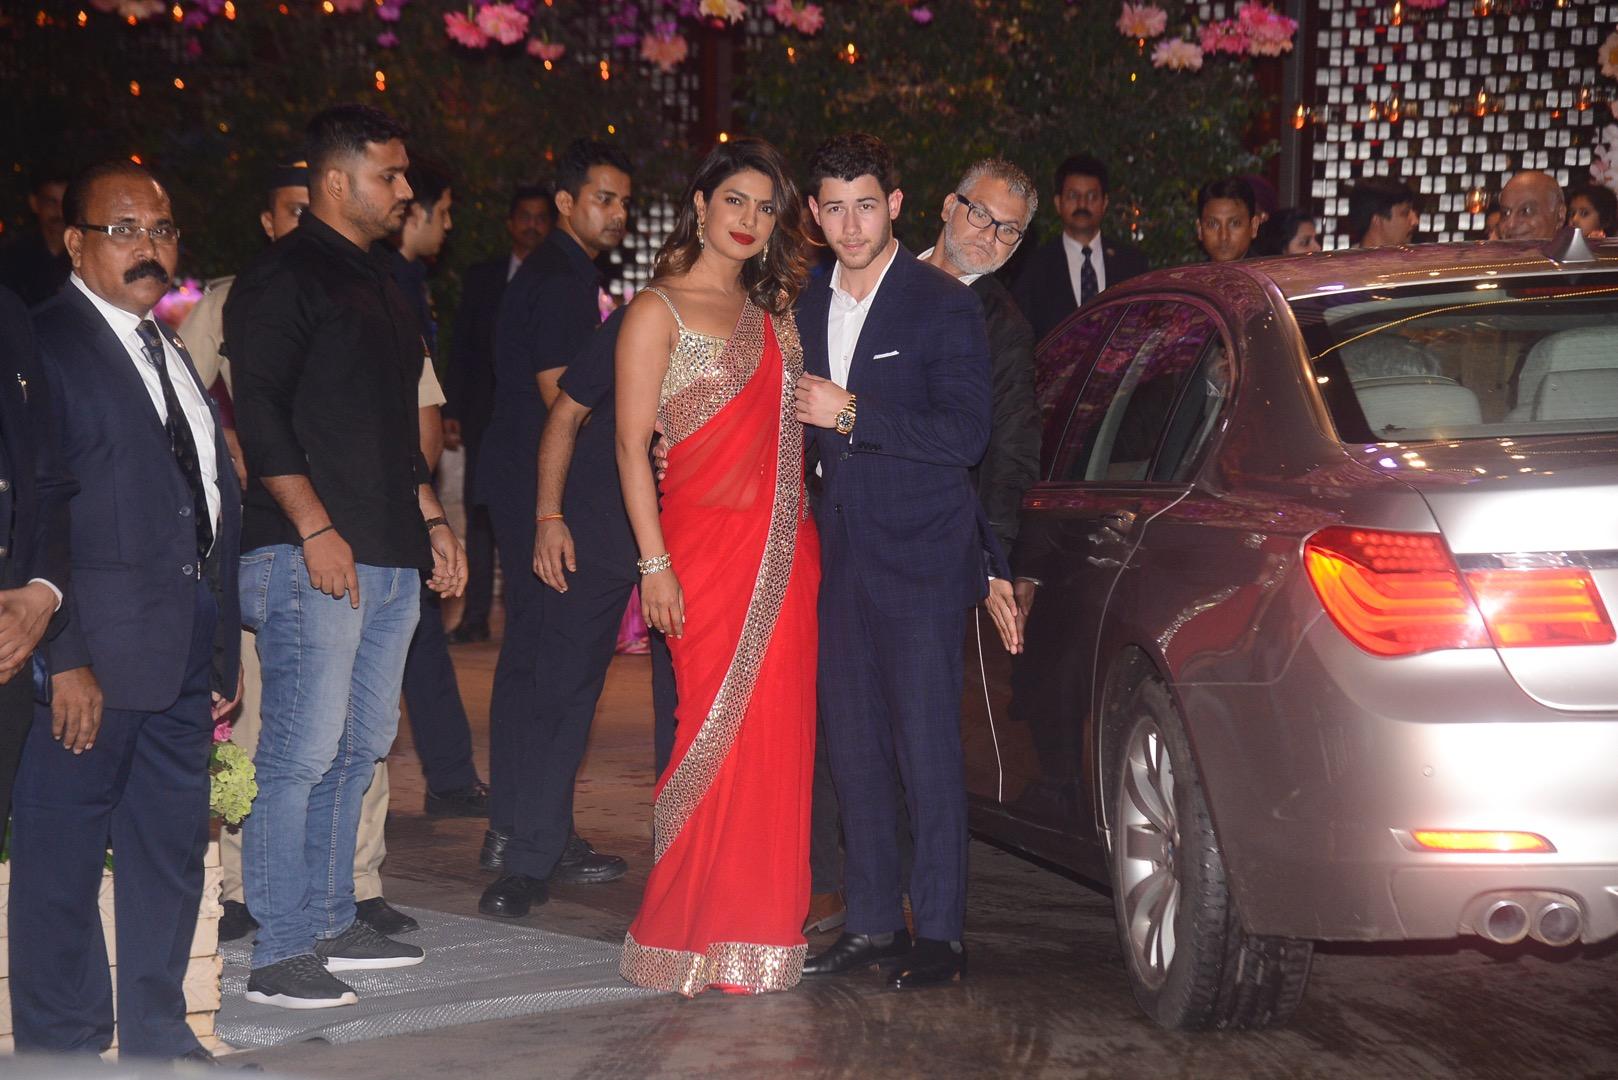 Priyanka Chopra and Nick Jonas attend Akash Ambani's pre-engagement bash in Mumbai, India. She looked stunning in a red sari dress while Nick looked smart in a suit.  Pictured: Priyanka Chopra,Nick Jonas Ref: SPL5007095 280618 NON-EXCLUSIVE Picture by: Viral Bhayani / SplashNews.com  Splash News and Pictures Los Angeles: 310-821-2666 New York: 212-619-2666 London: 0207 644 7656 Milan: +39 02 4399 8577 Sydney: +61 02 9240 7700 photodesk@splashnews.com  World Rights, No India Rights